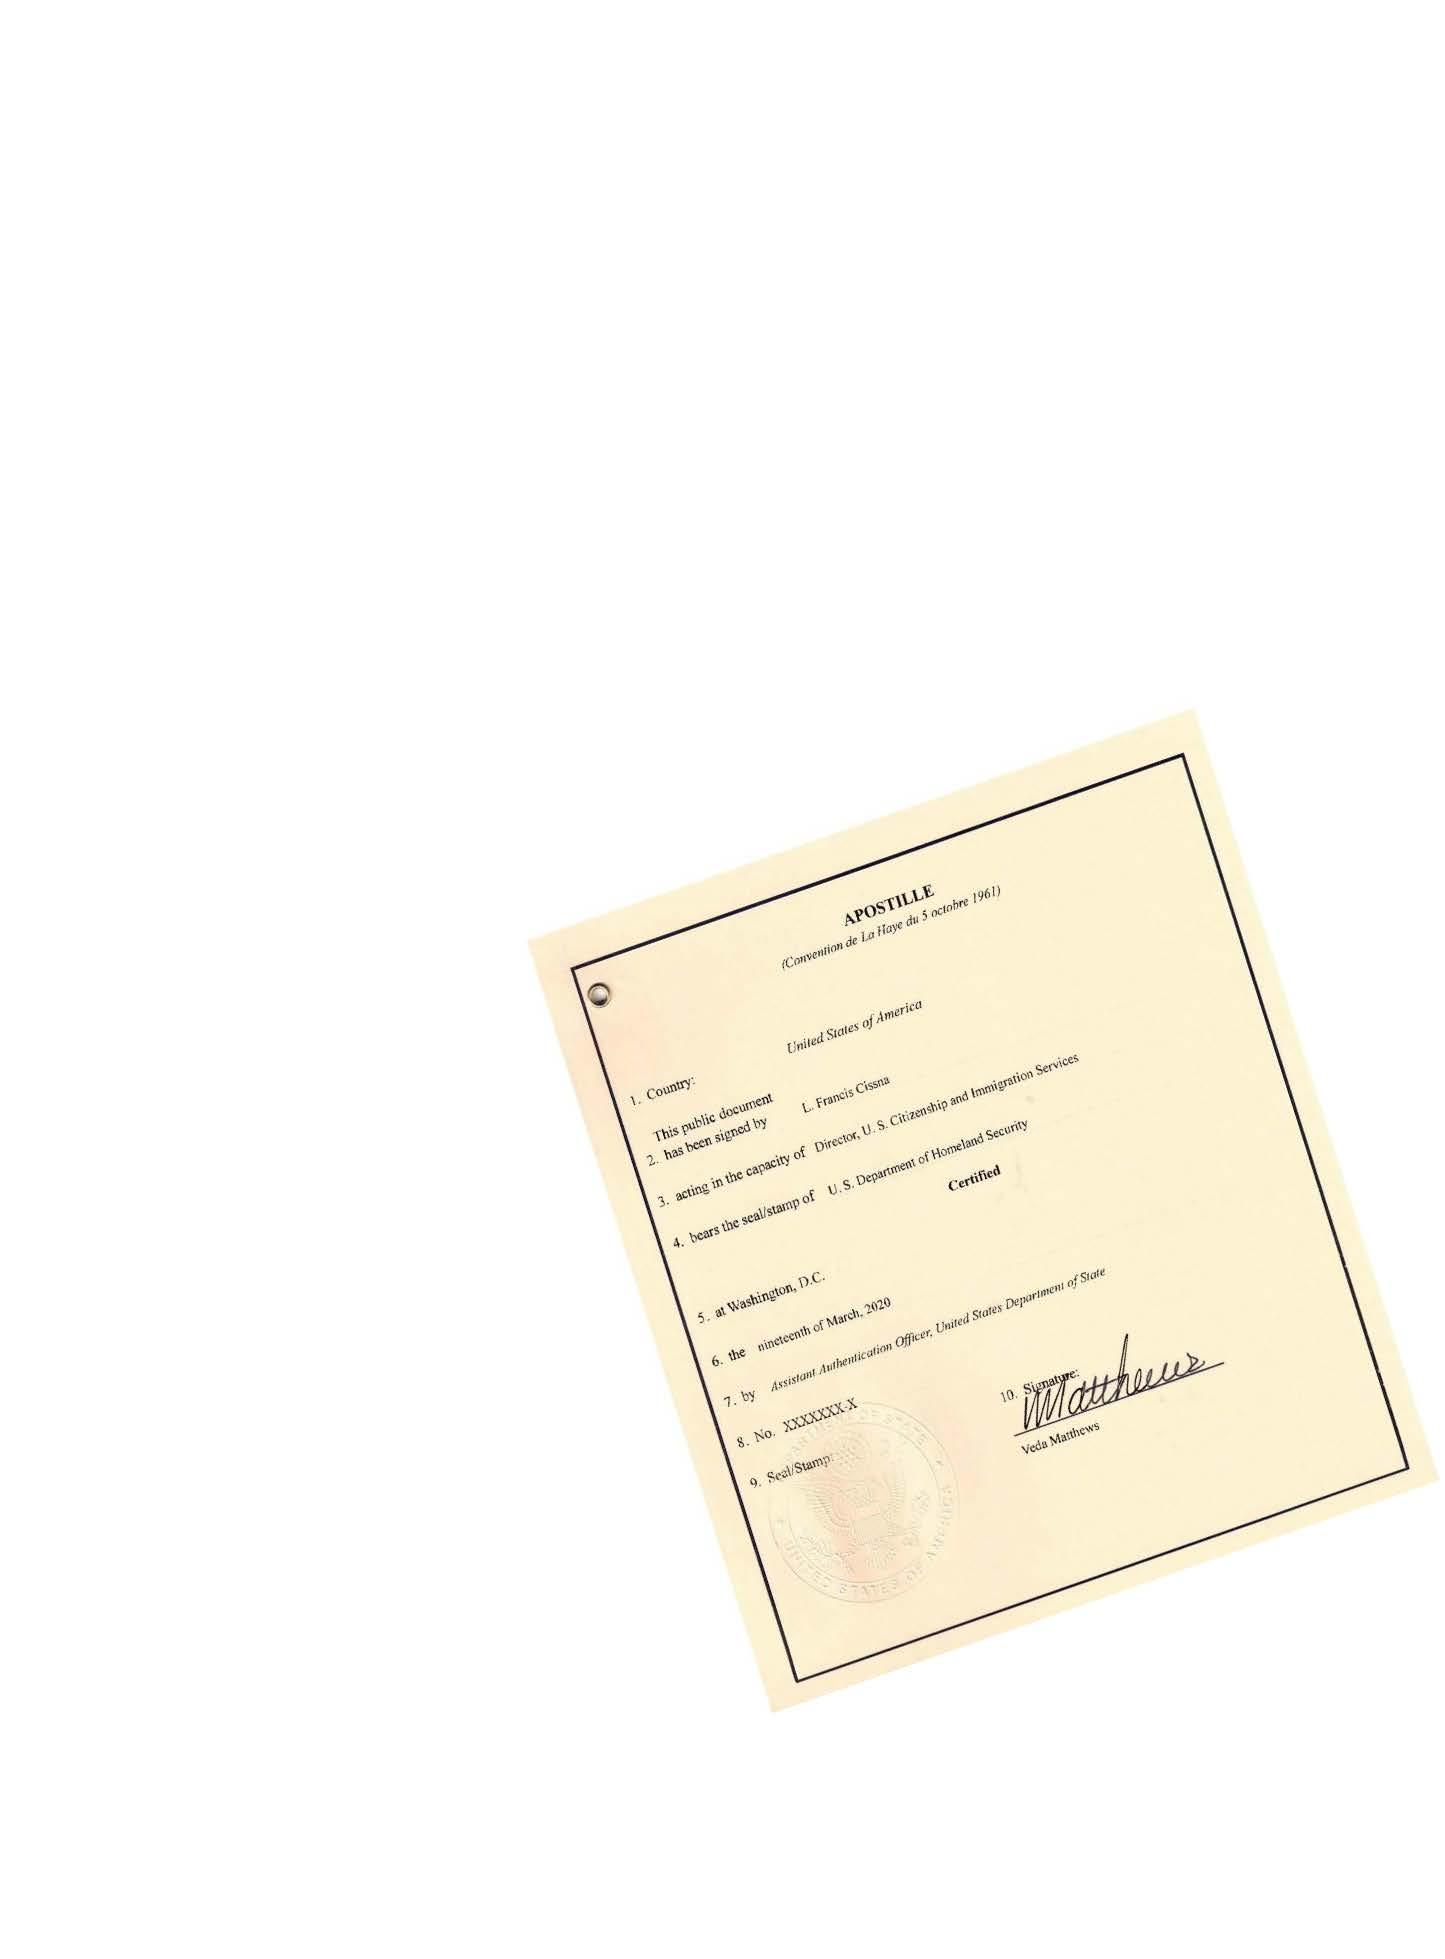 https://apostillalegatille.com/wp-content/uploads/2020/08/Certificate-of-Naturalization-Apostille.jpg